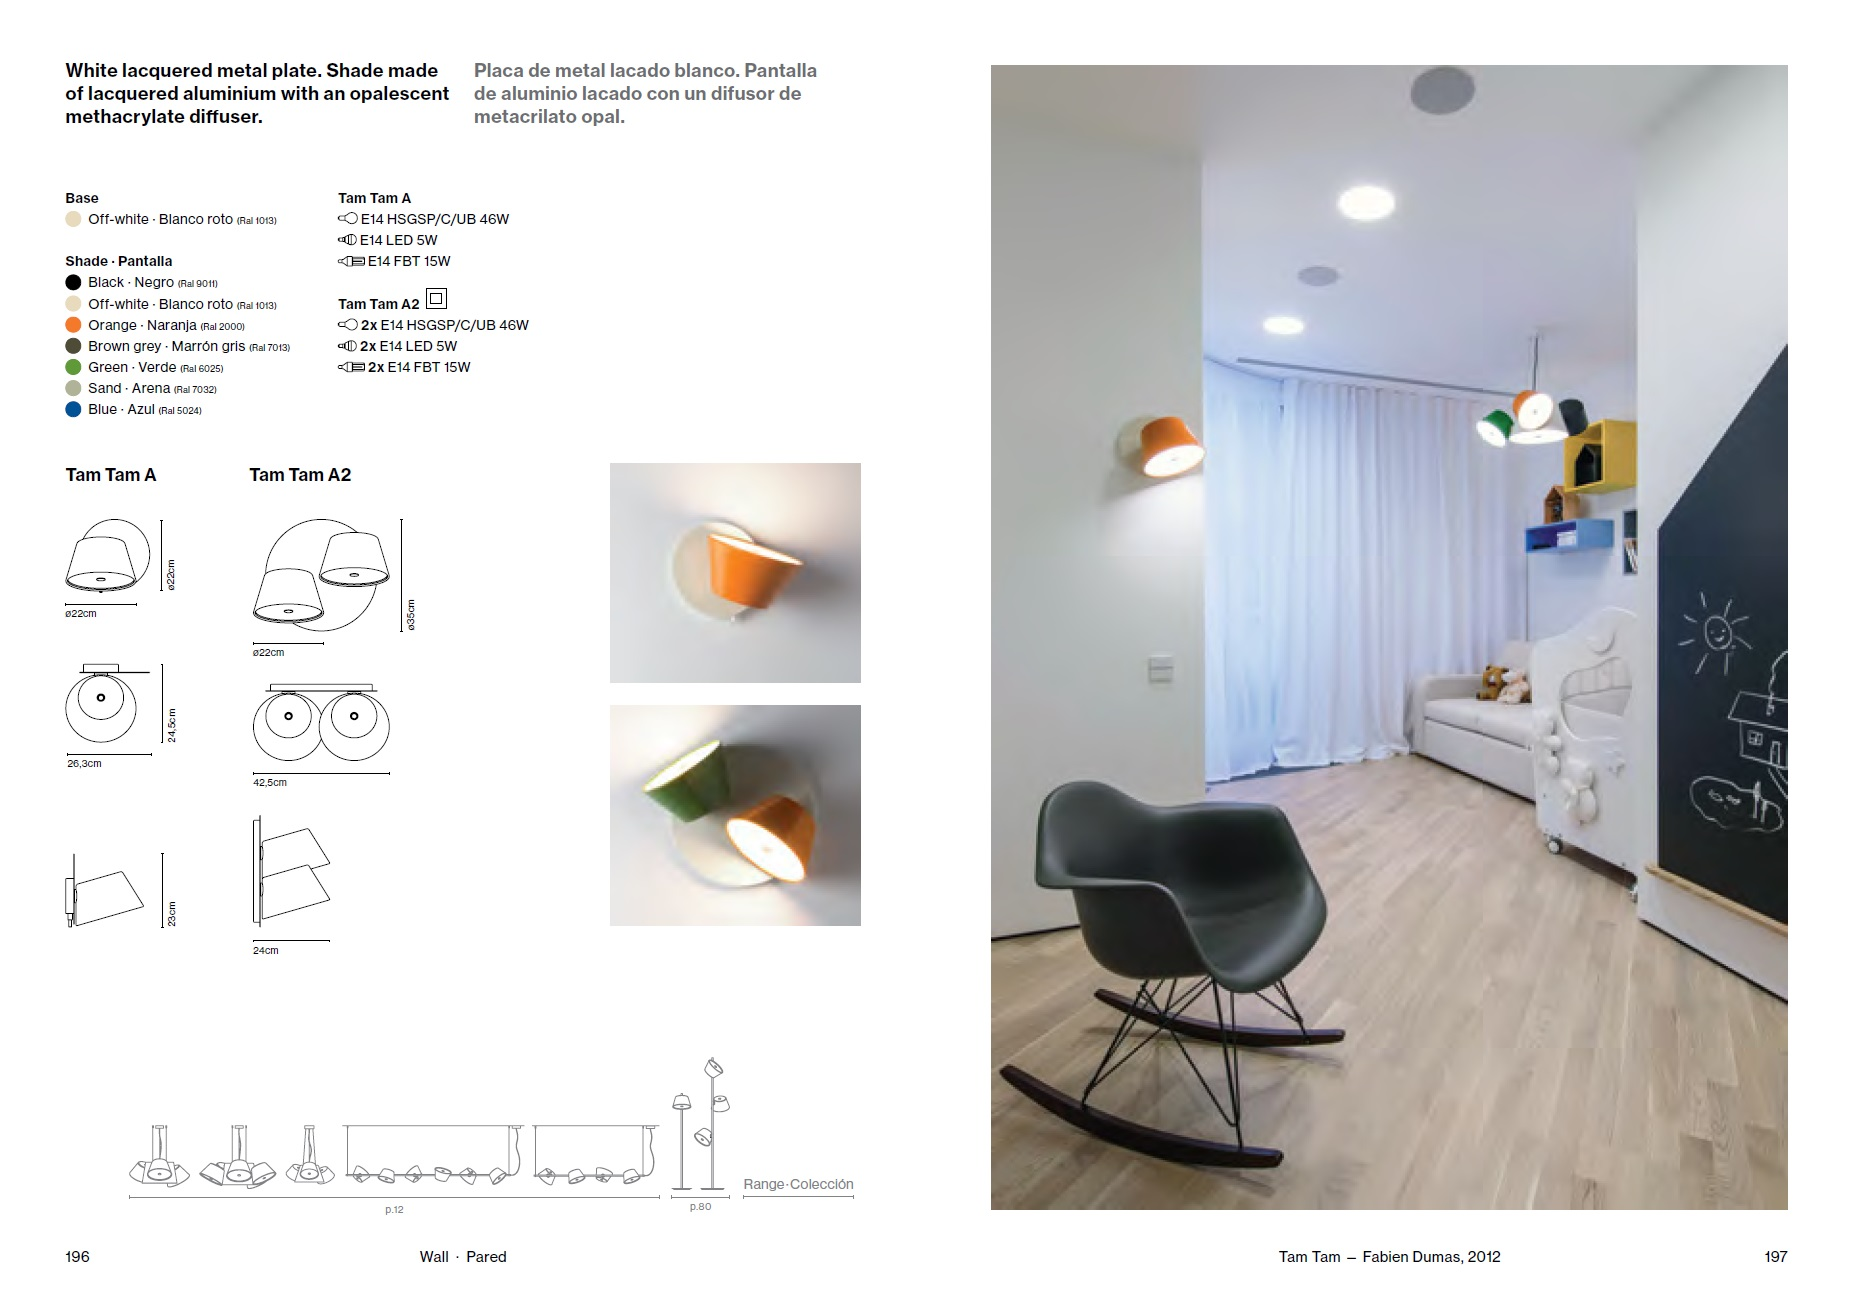 marset tam tam estructura base 2 para aplique a633 014 35 l mparas de dise o. Black Bedroom Furniture Sets. Home Design Ideas